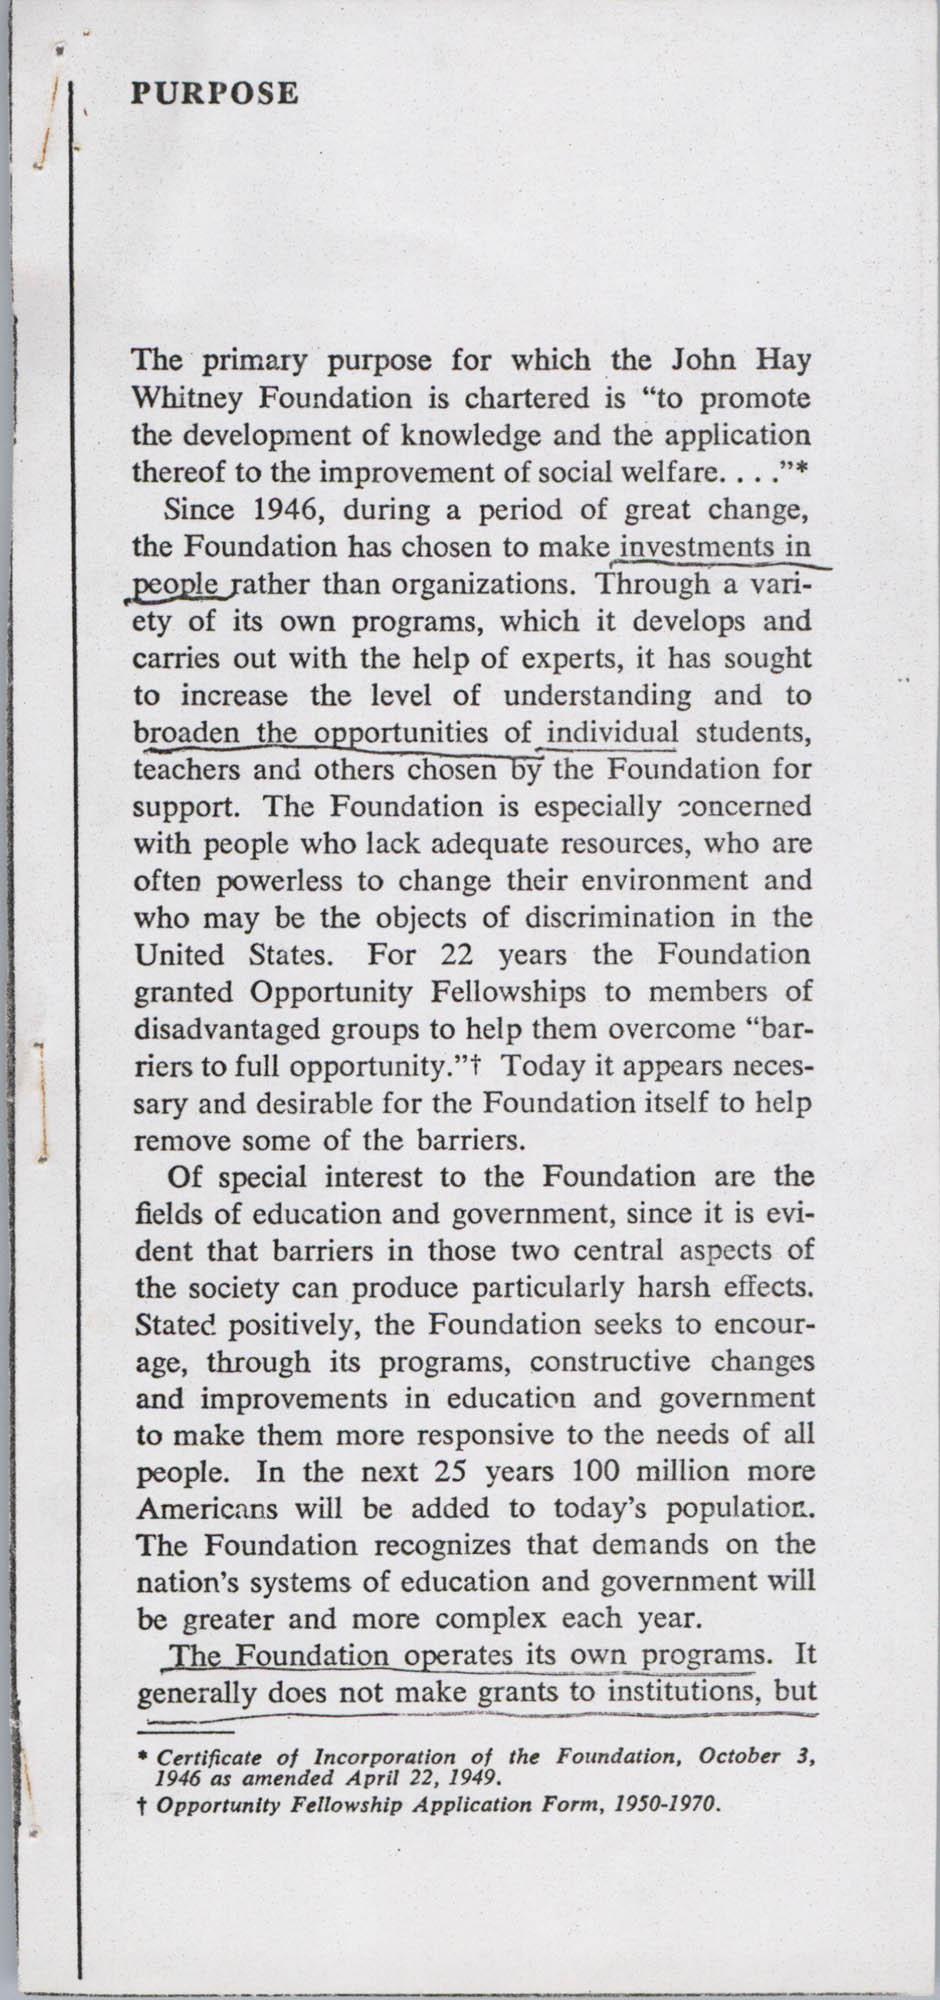 John Hay Whitney Foundation, Page 2